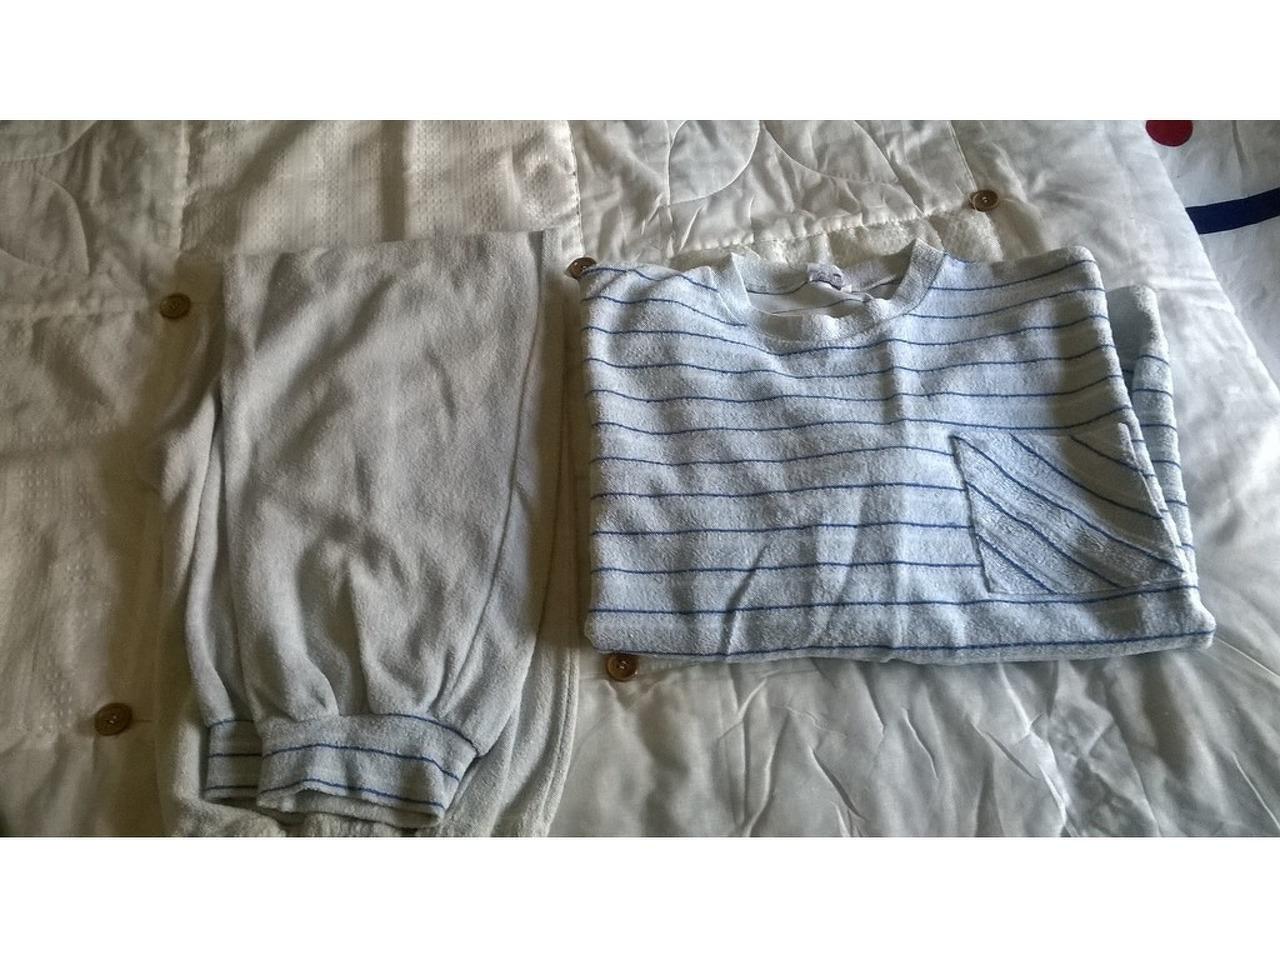 Pijamas (segunda mão) - 8/12